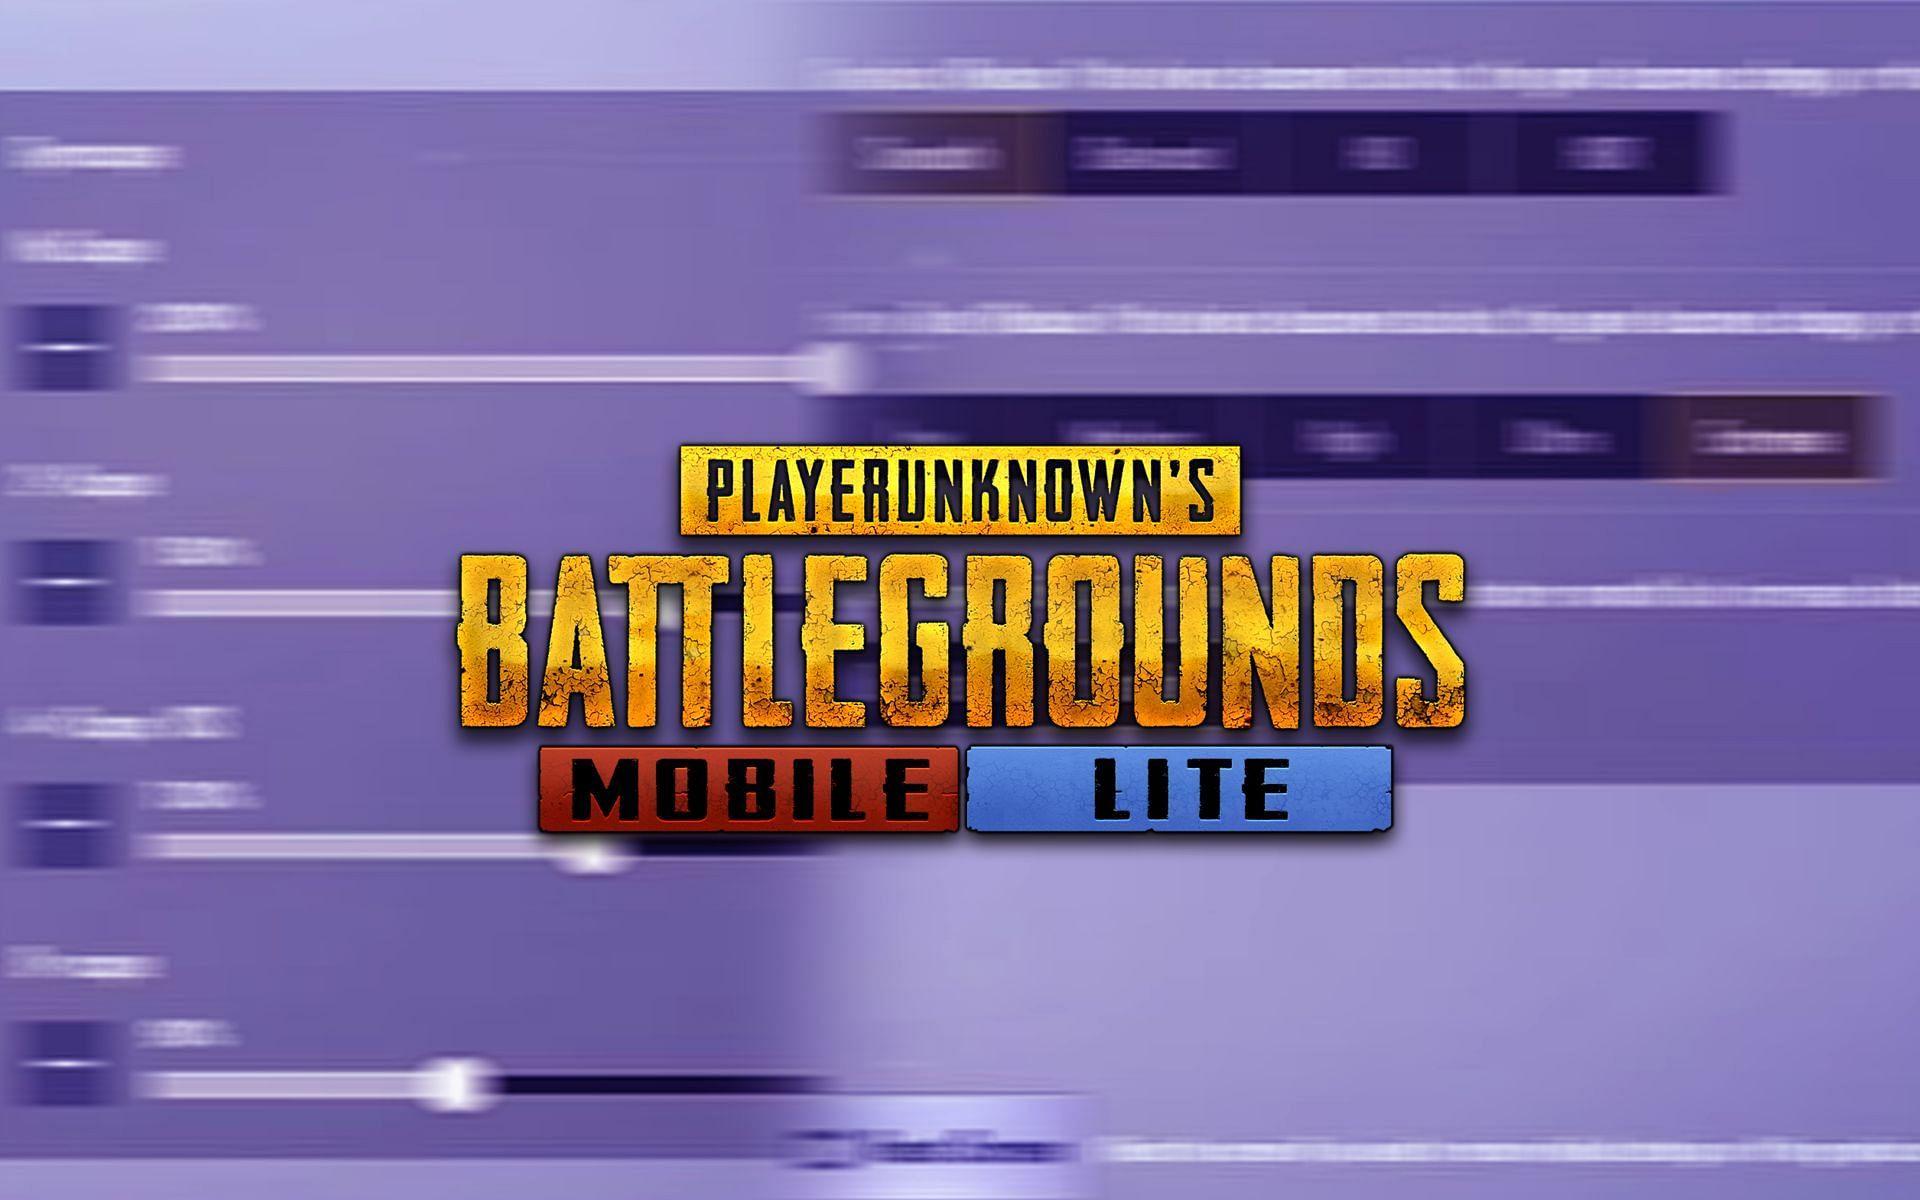 PUBG Mobile Lite sensitivity and graphics settings for smooth gameplay (Image via Krafton)